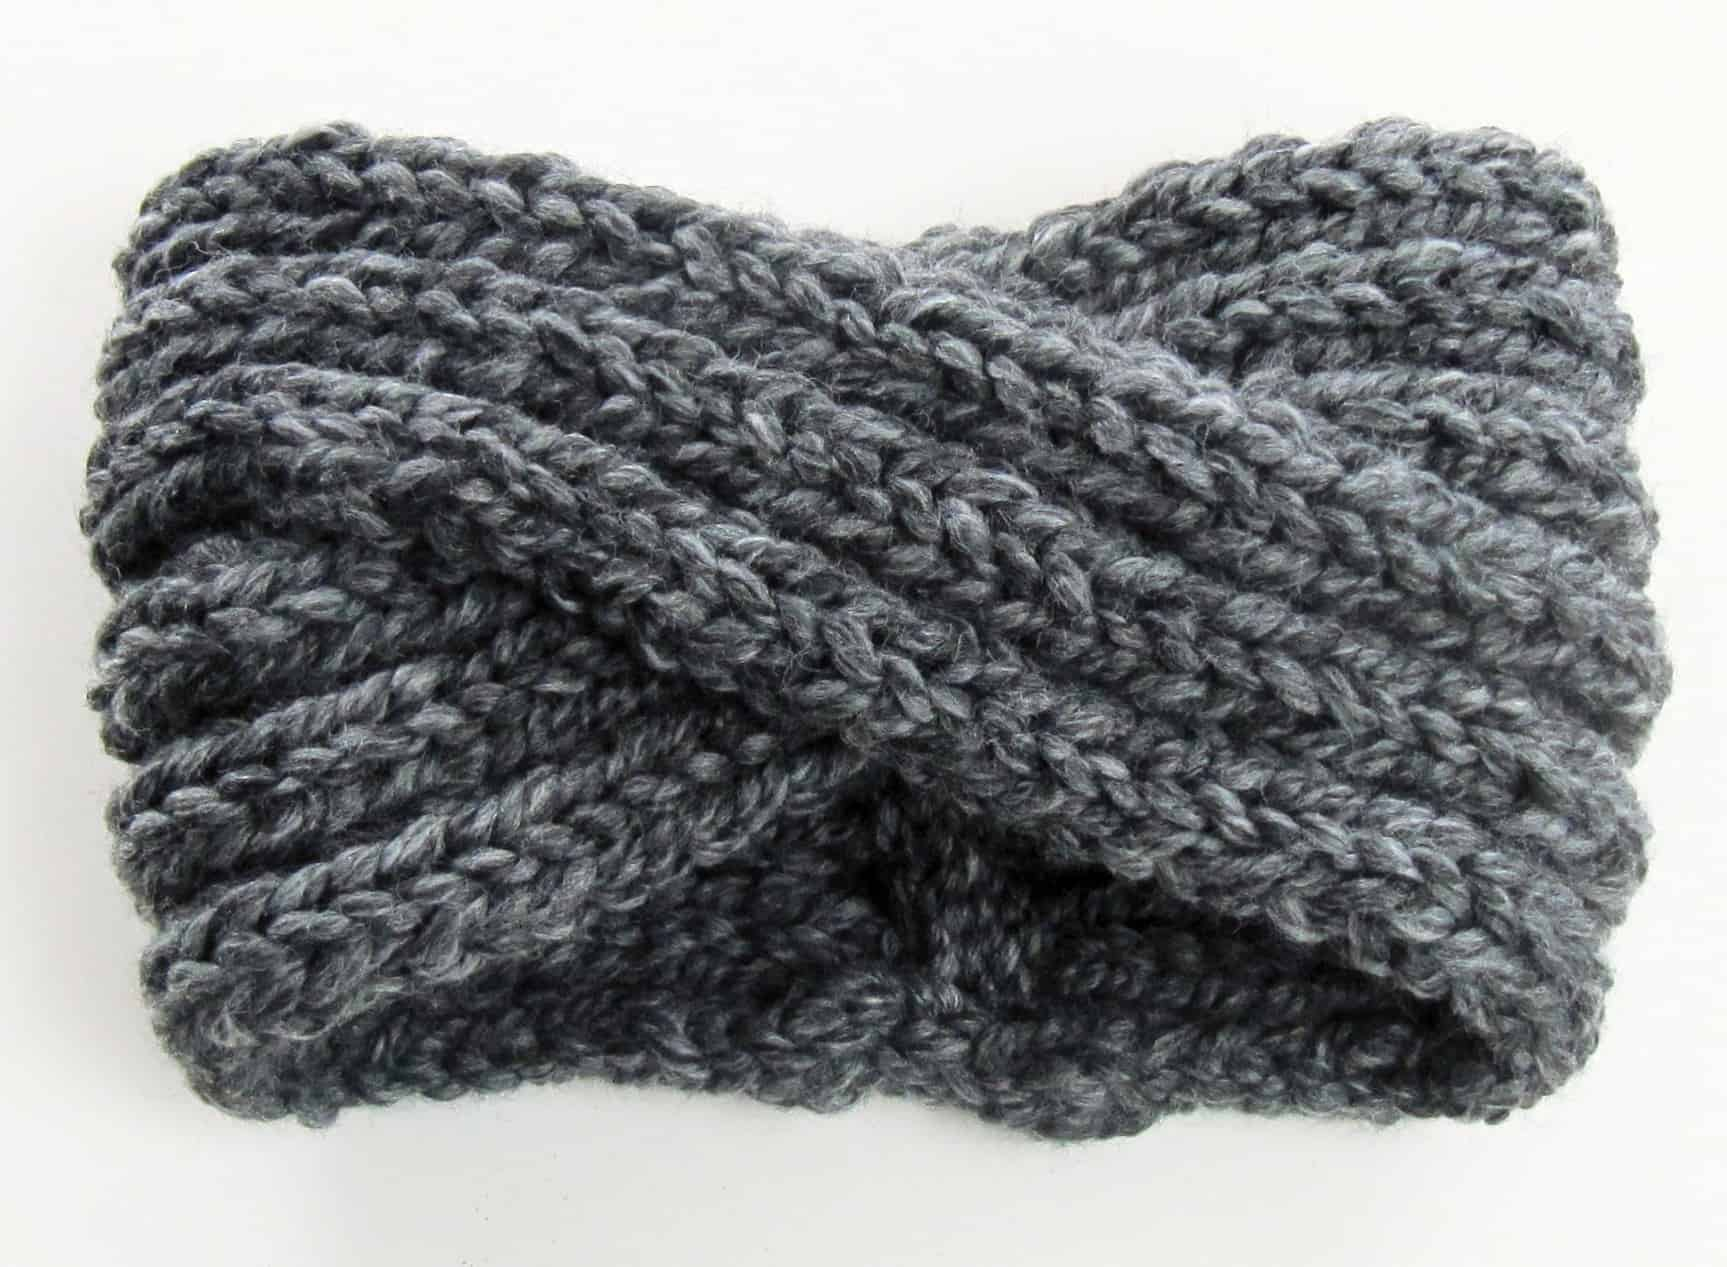 Homemade Coziness Smart Knitted Ear Warmer And Headband Patterns